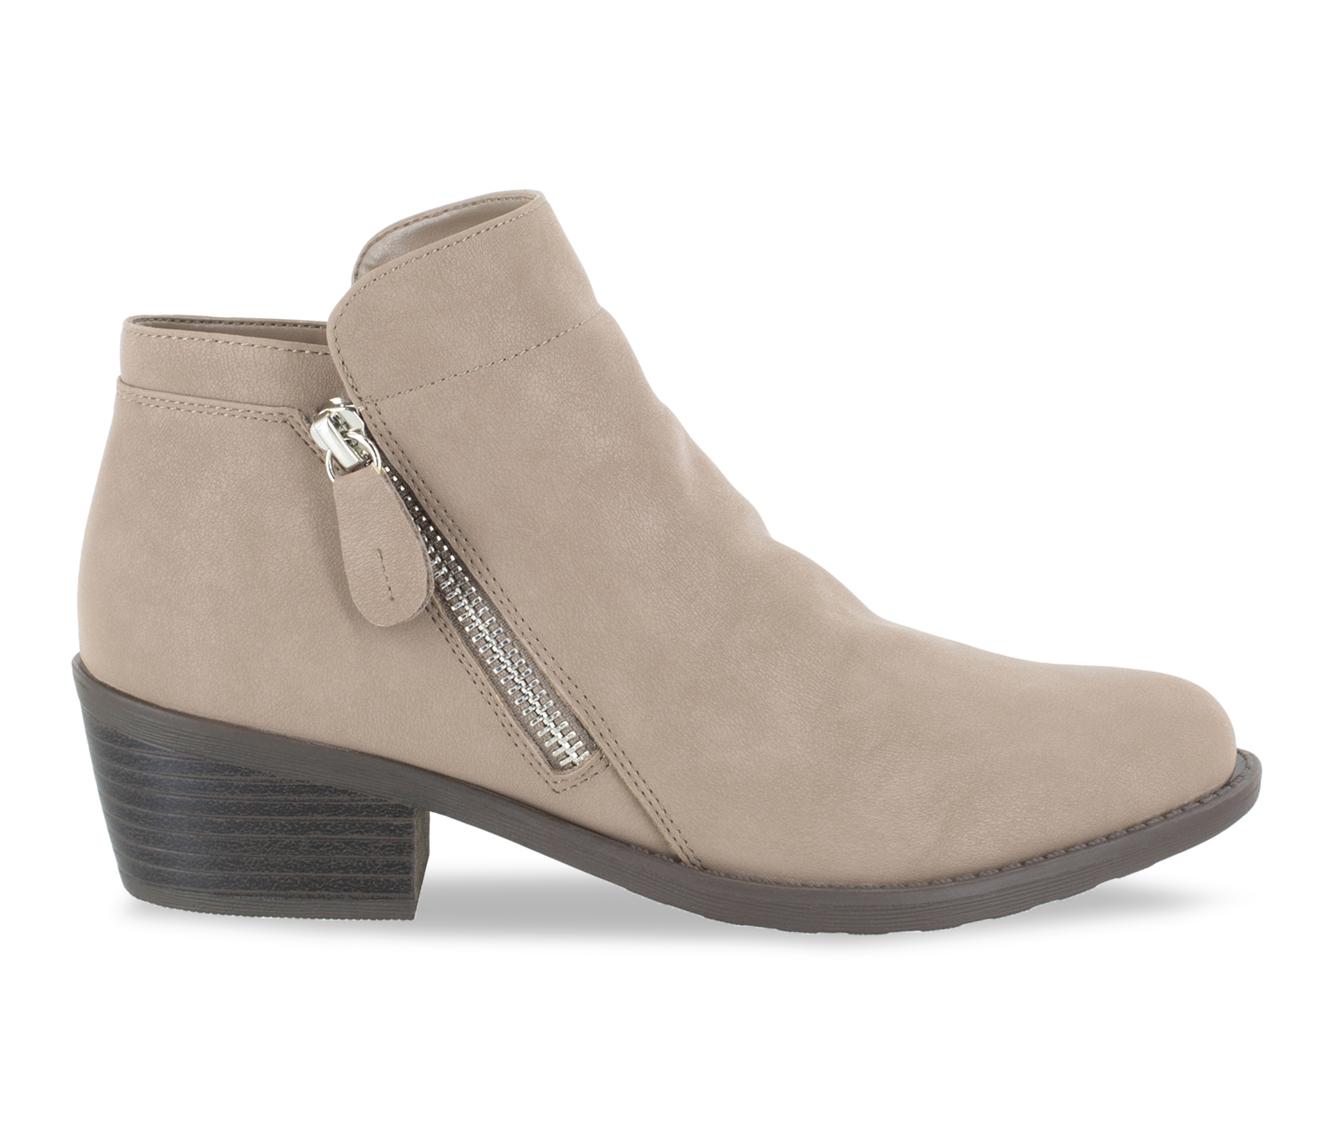 Easy Street Gusto Women's Boots (Beige - Canvas)